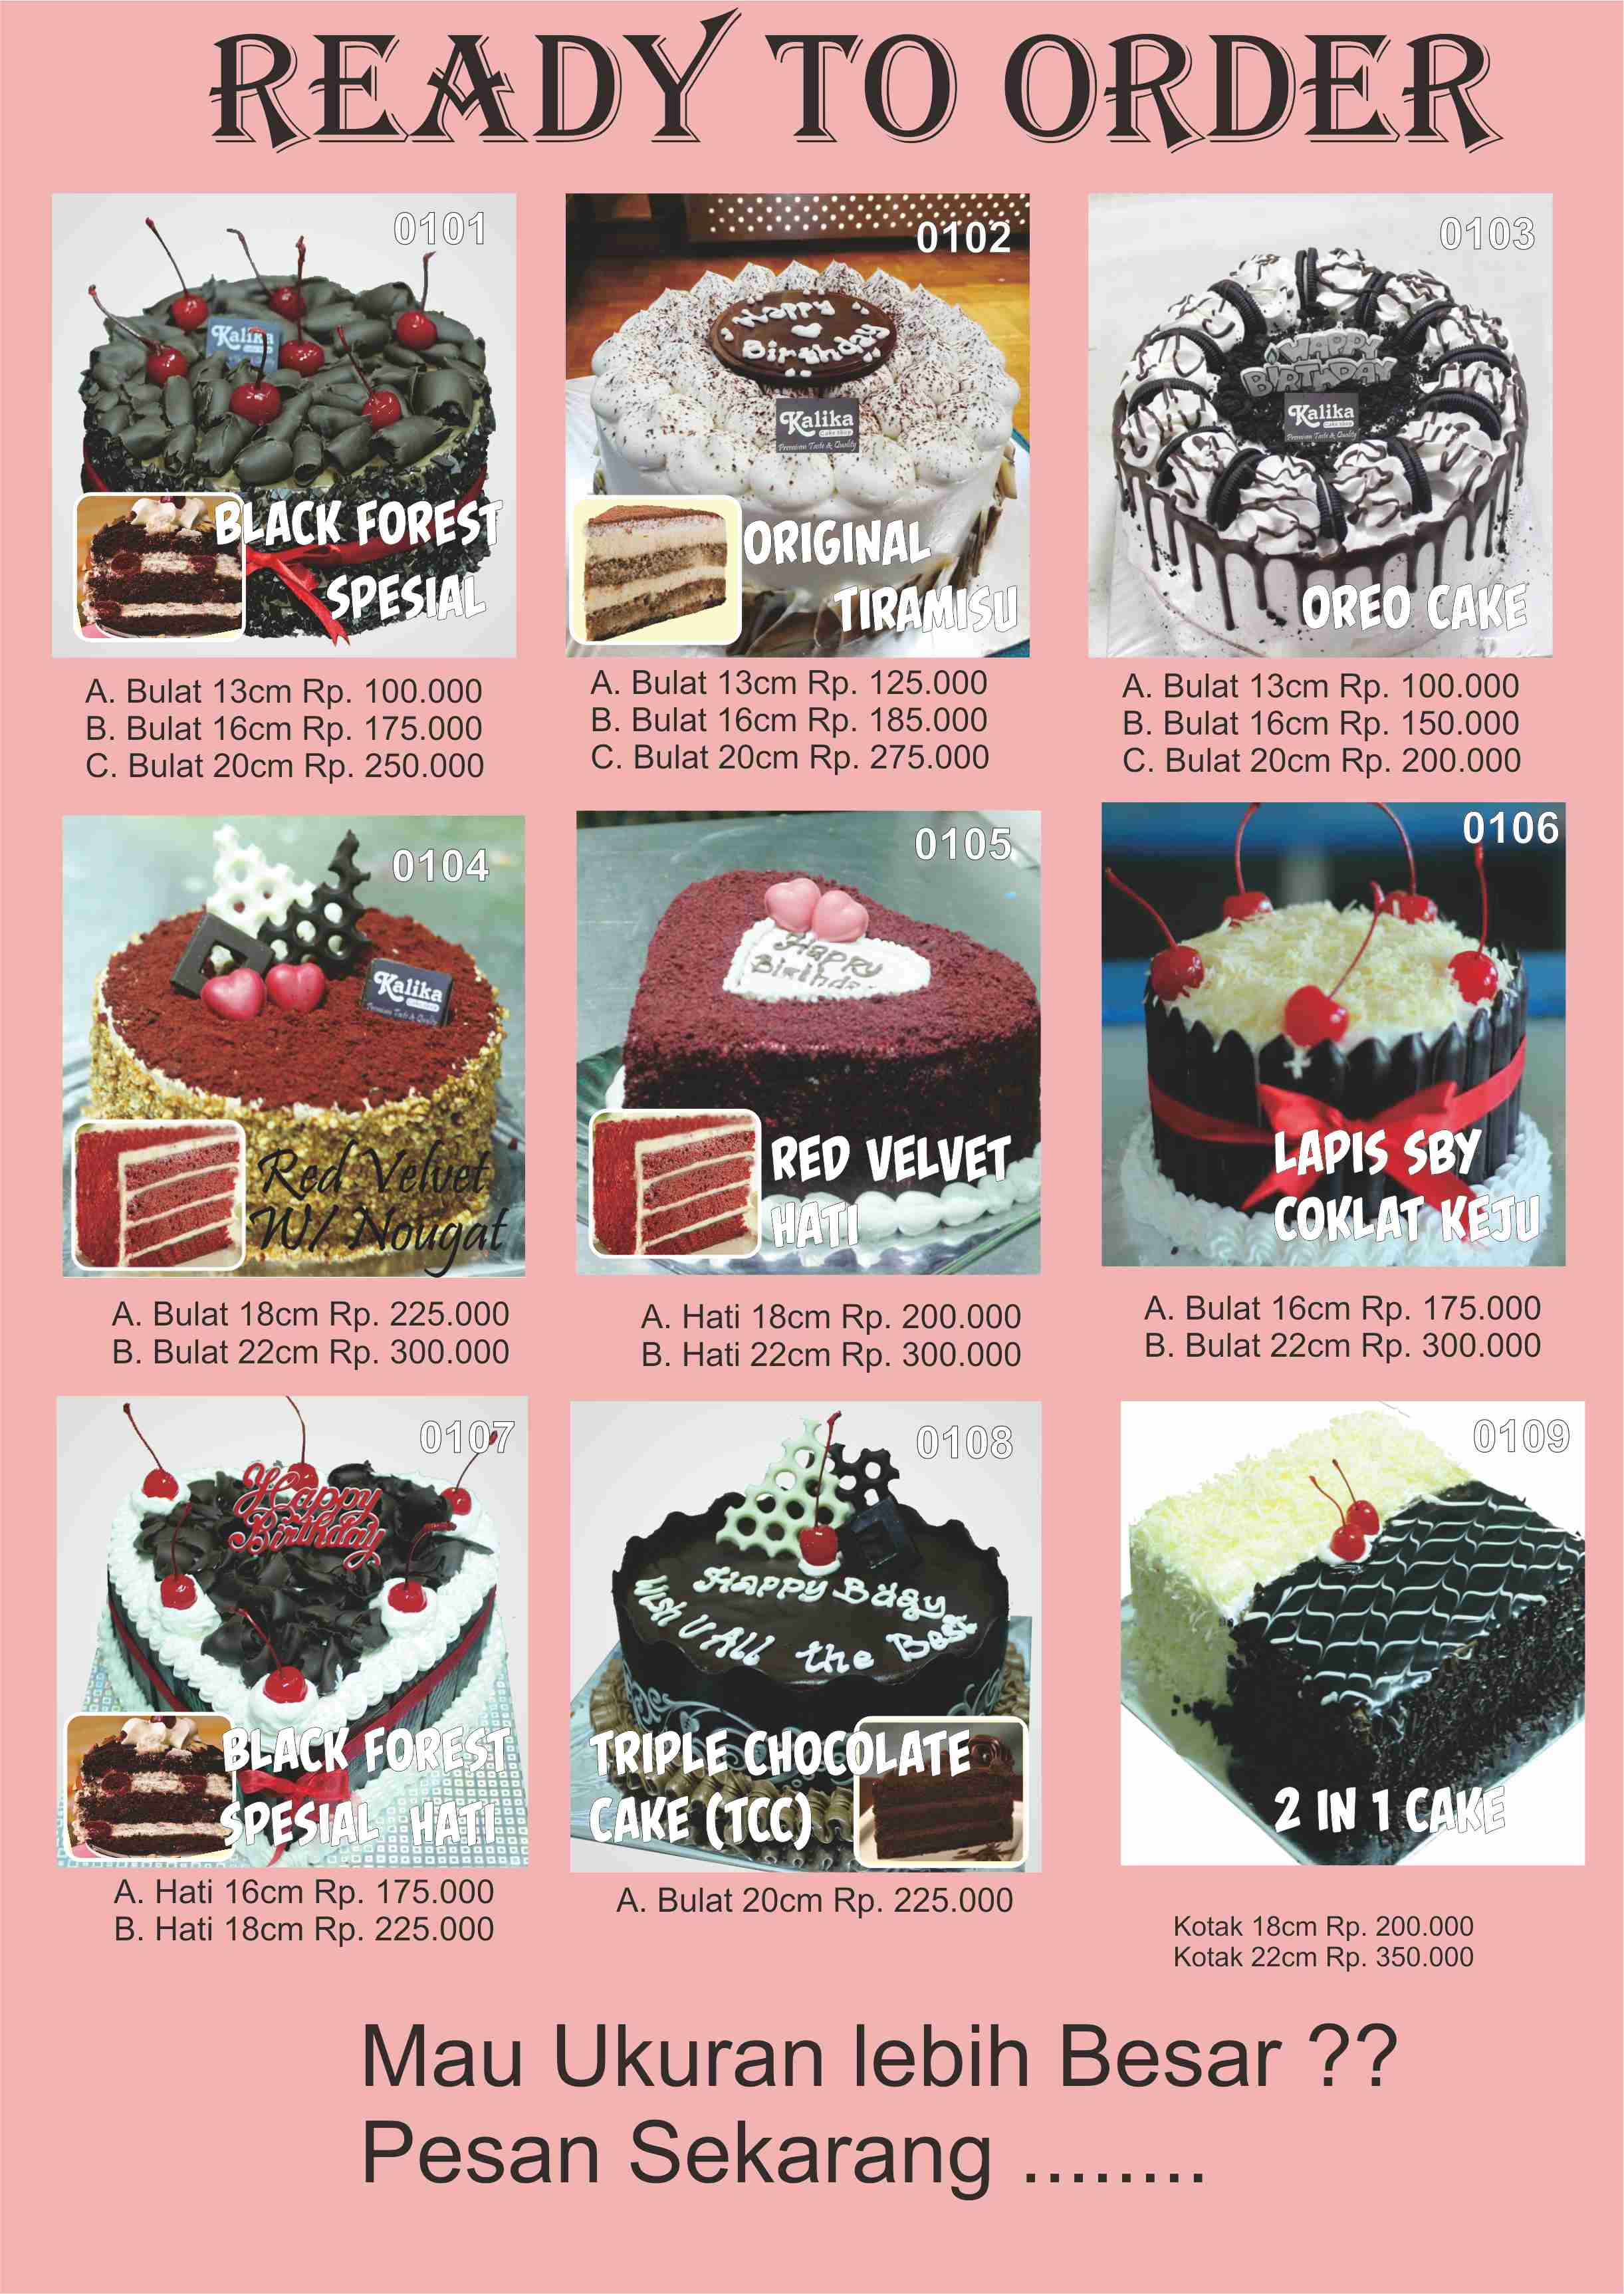 Kue Ulang Tahun Bandung | Toko Kue Ulang Tahun Bandung | Kue Ulang Tahun